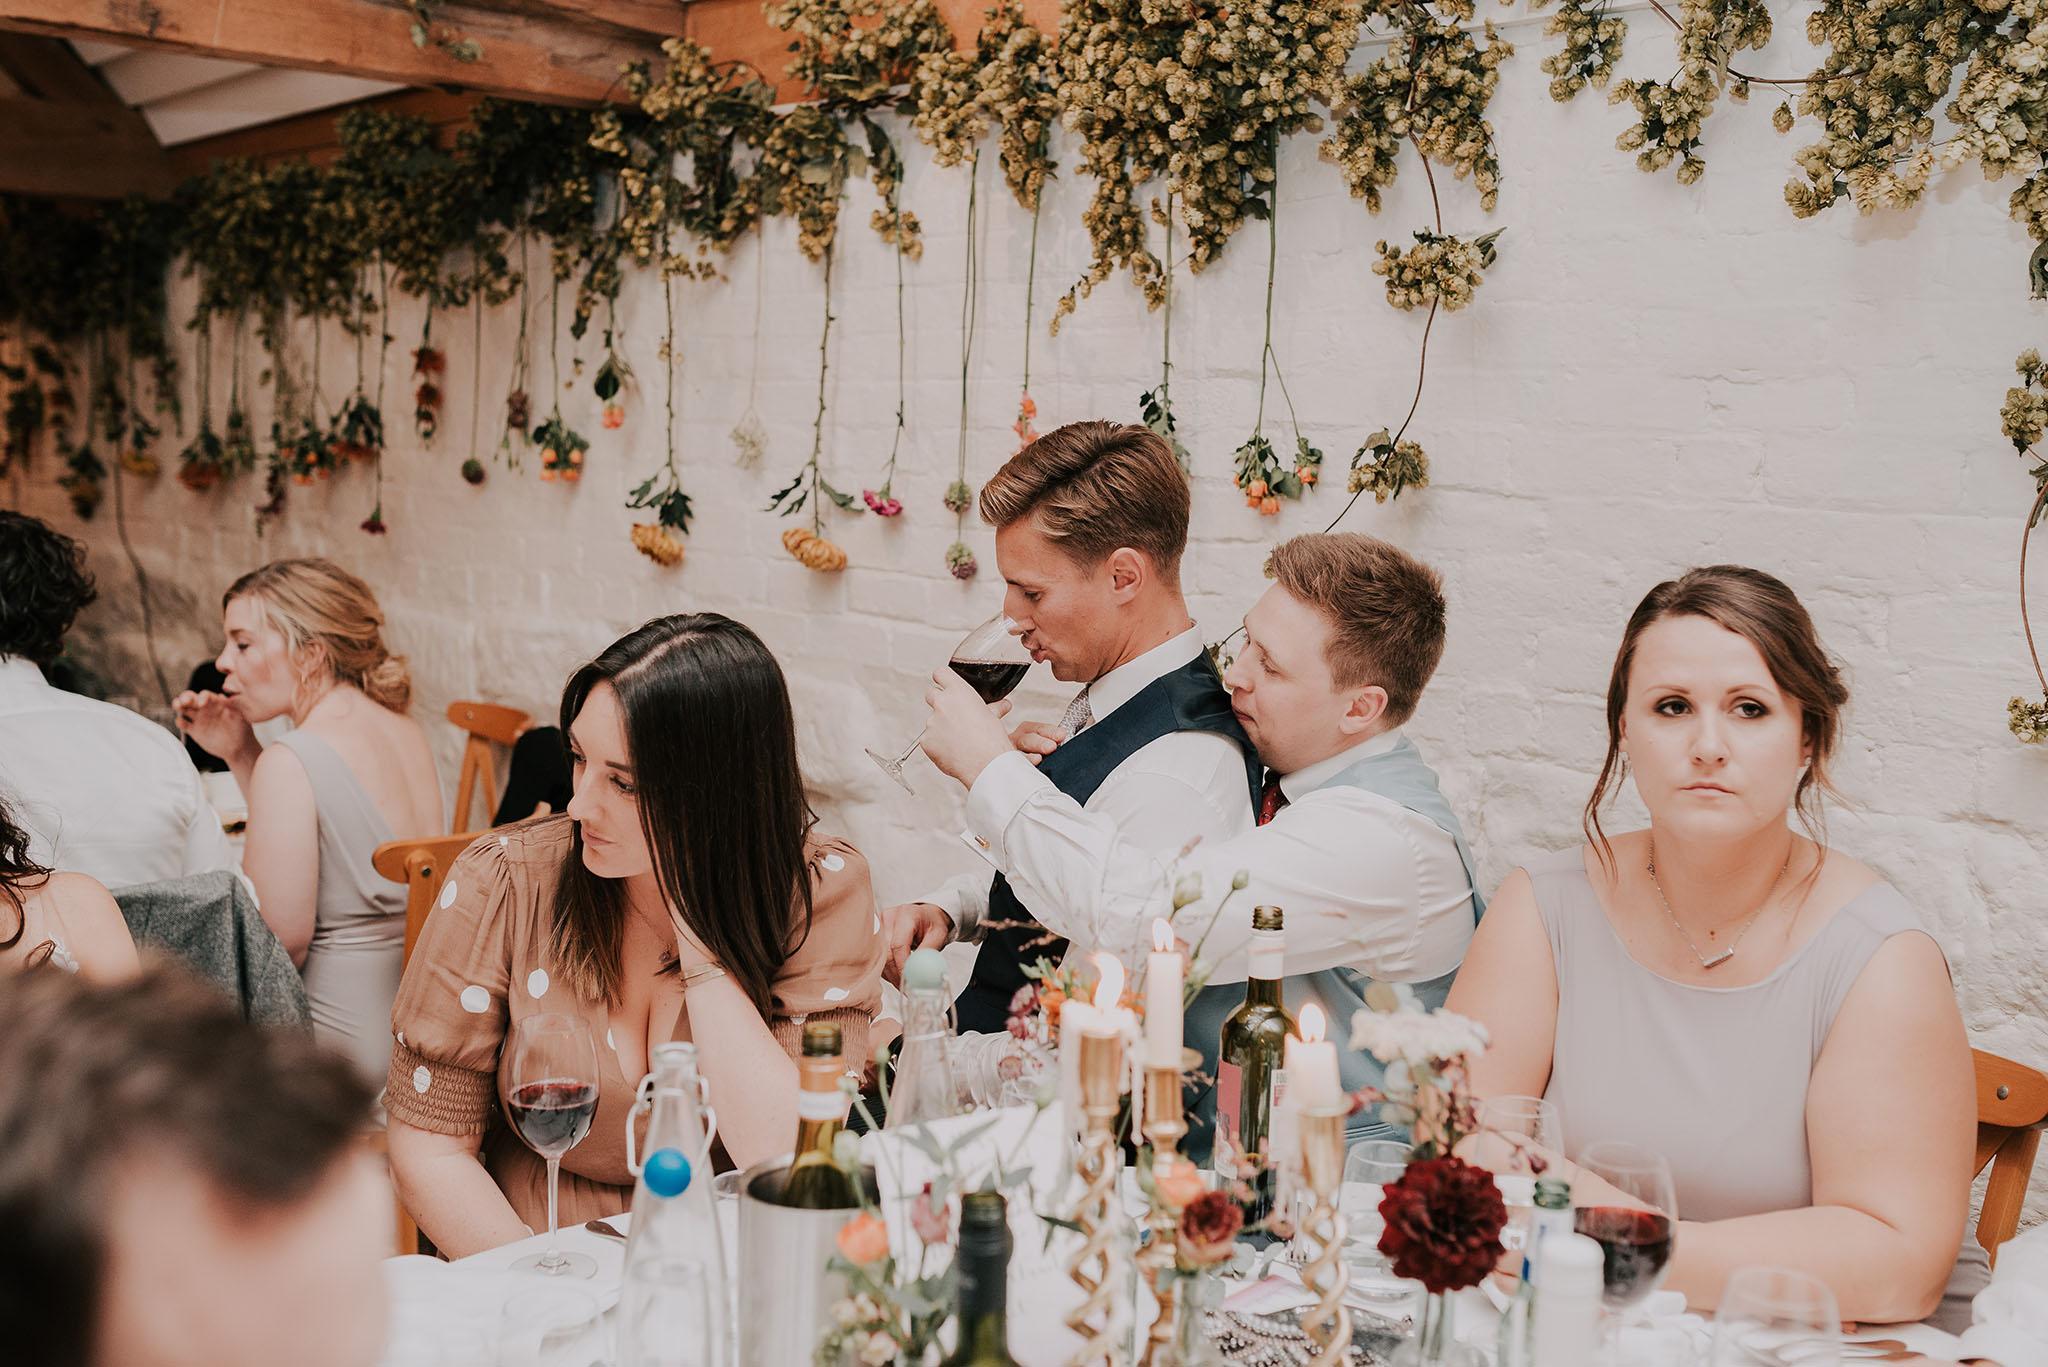 scott-stockwell-photography-wedding-58.jpg